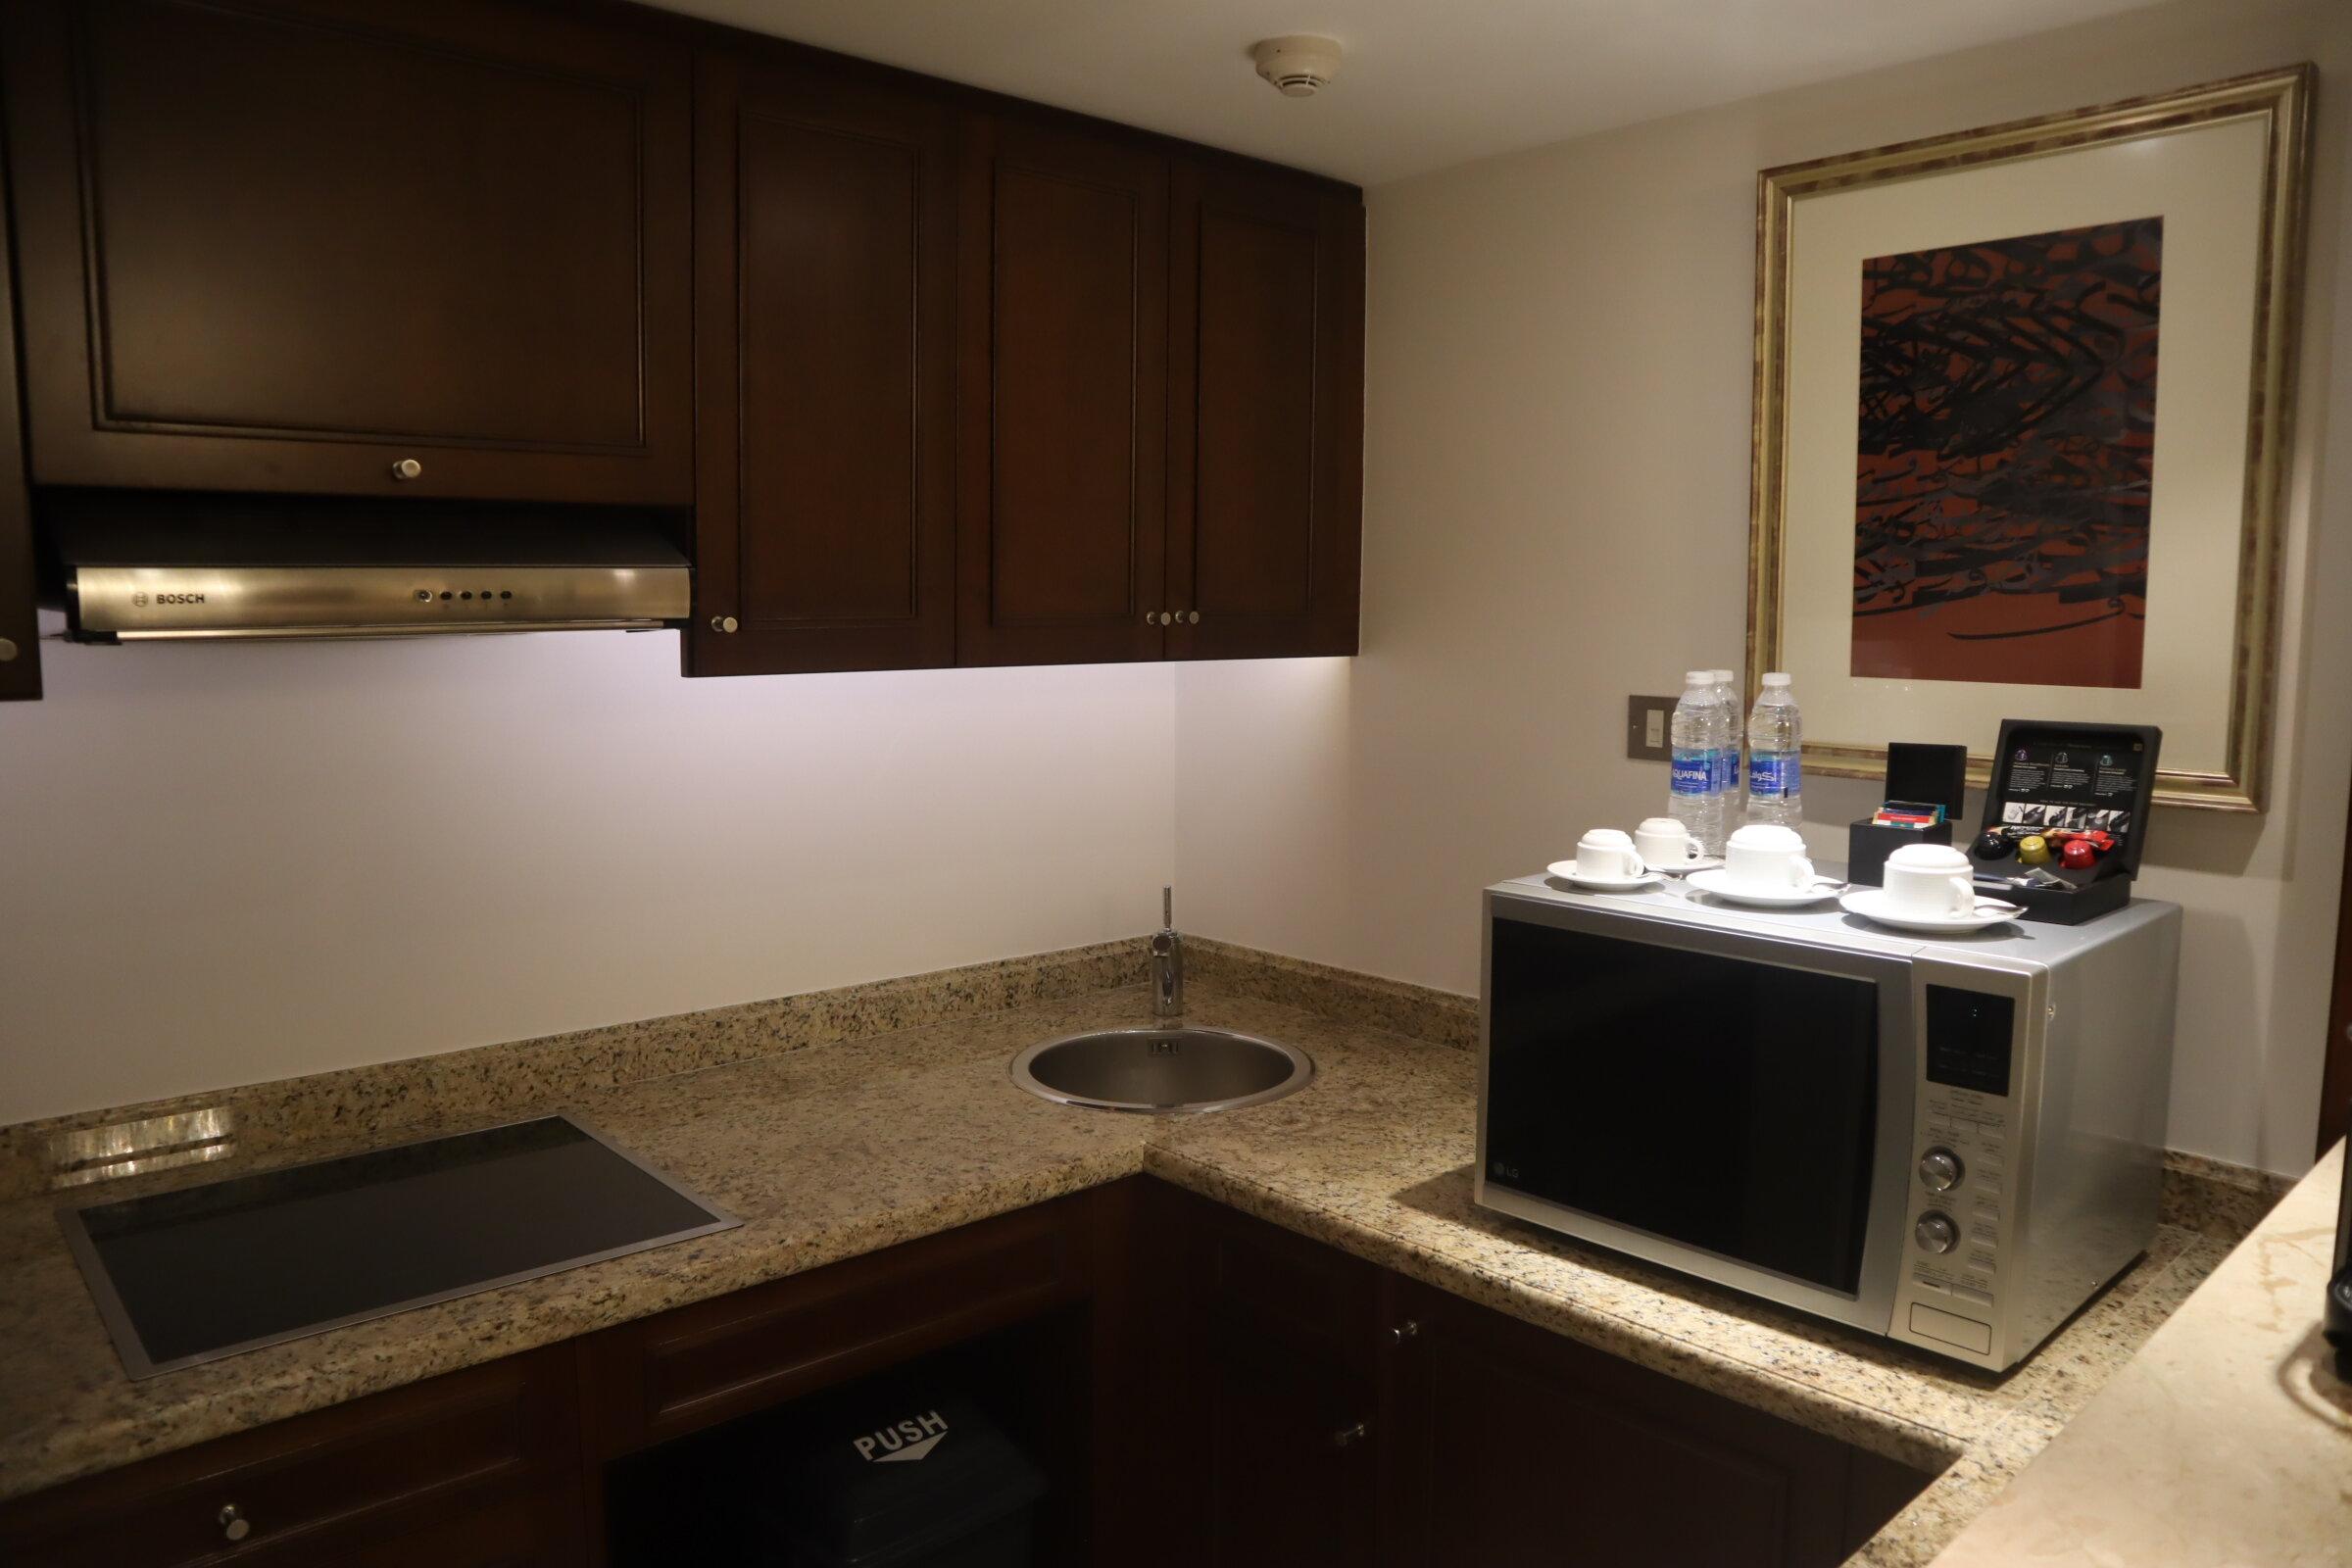 Sheraton Oman – Studio Suite kitchenette